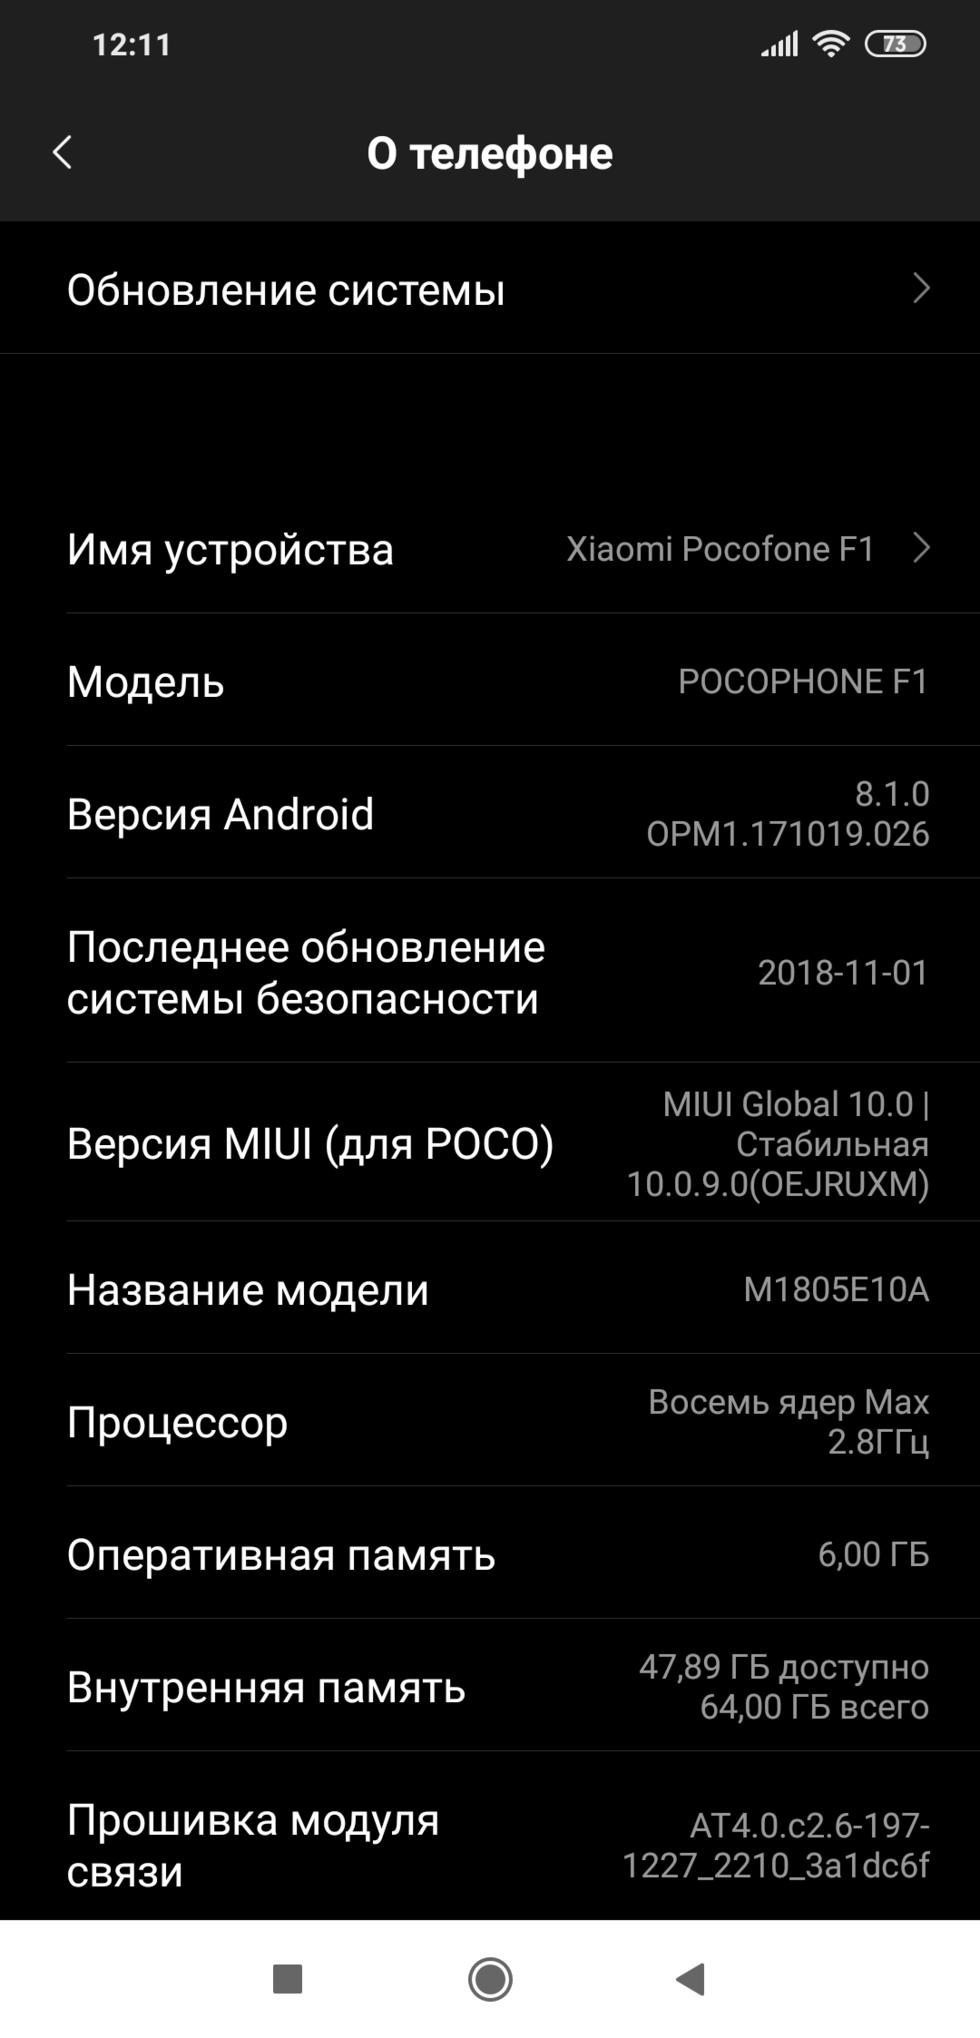 Screenshot_2019-01-12-12-11-49-457_com.android.settings.png